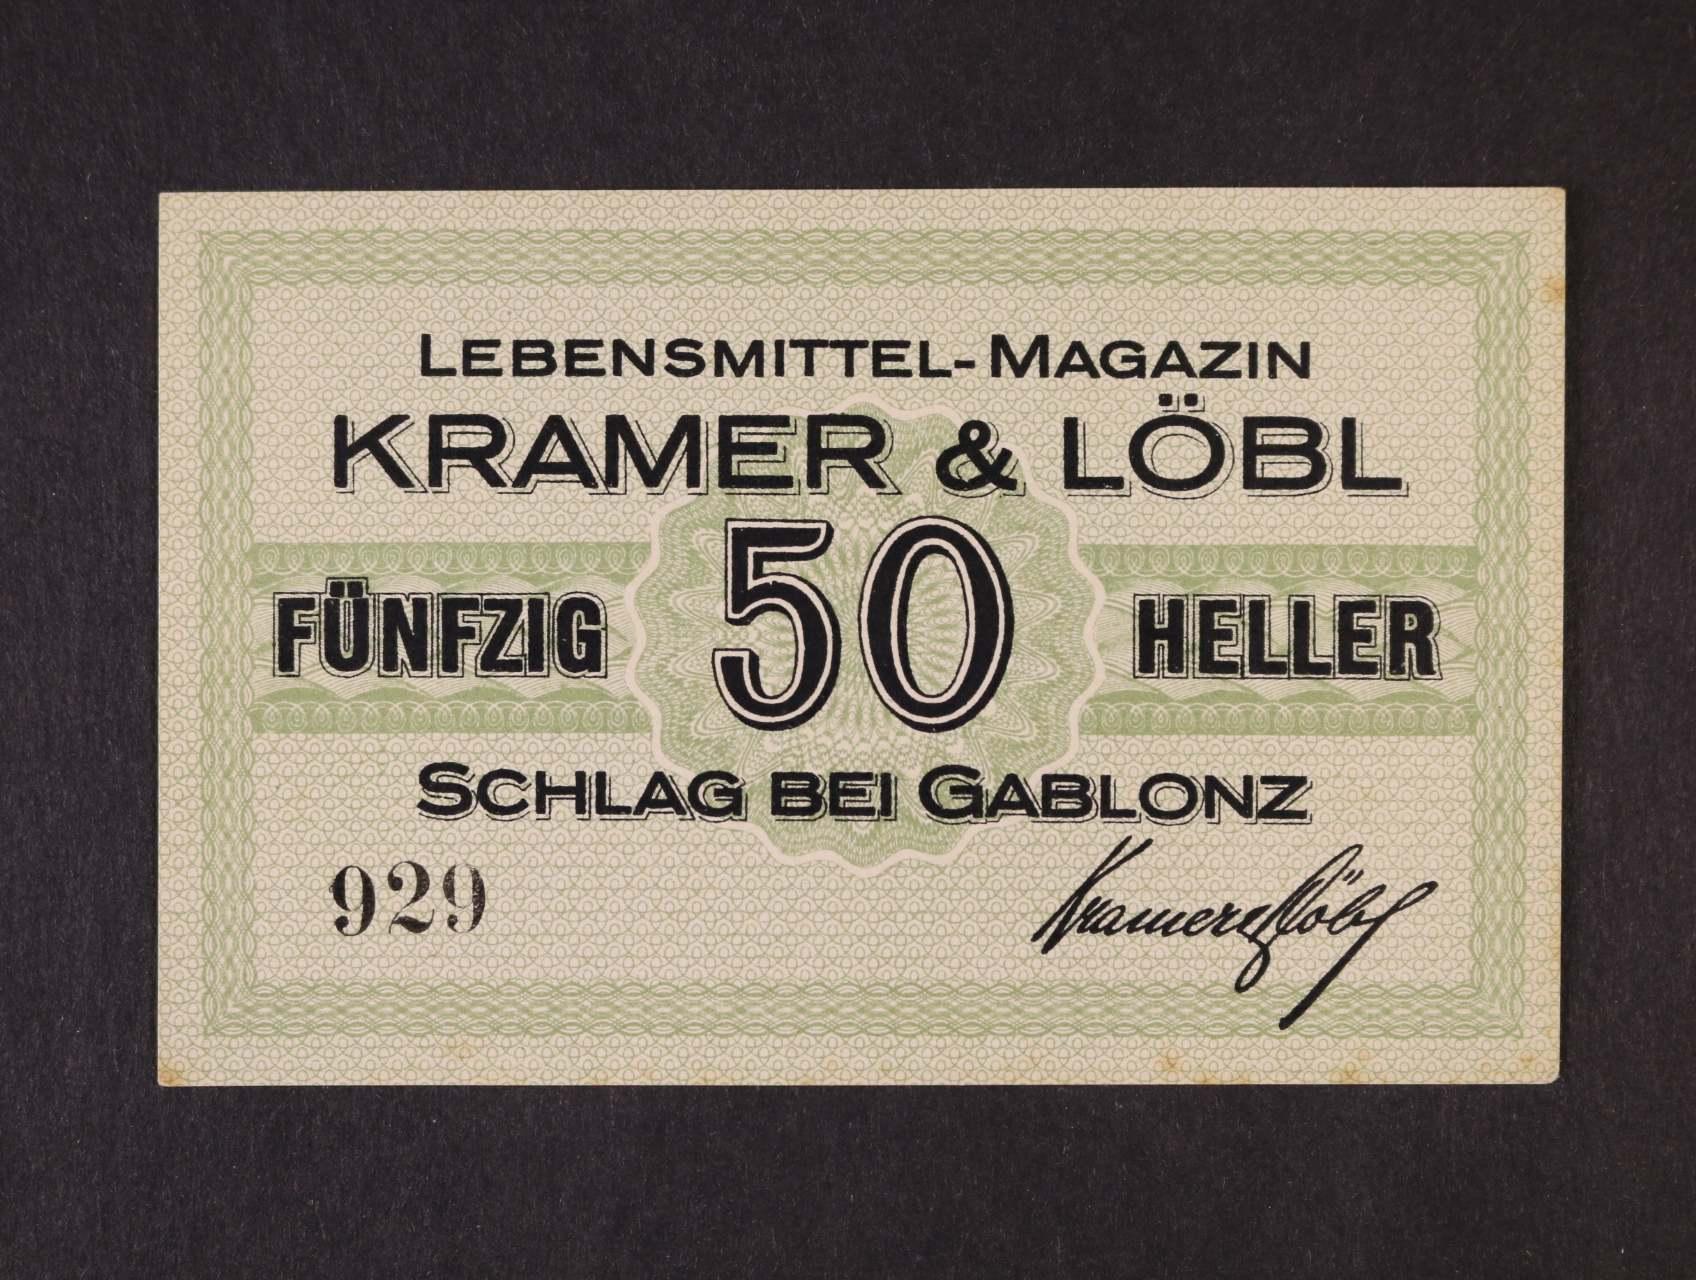 Schlag bei Gablonz (Jablonecké Paseky), 50 h bl Kramer & Löbl, D,H, 188.1.3a